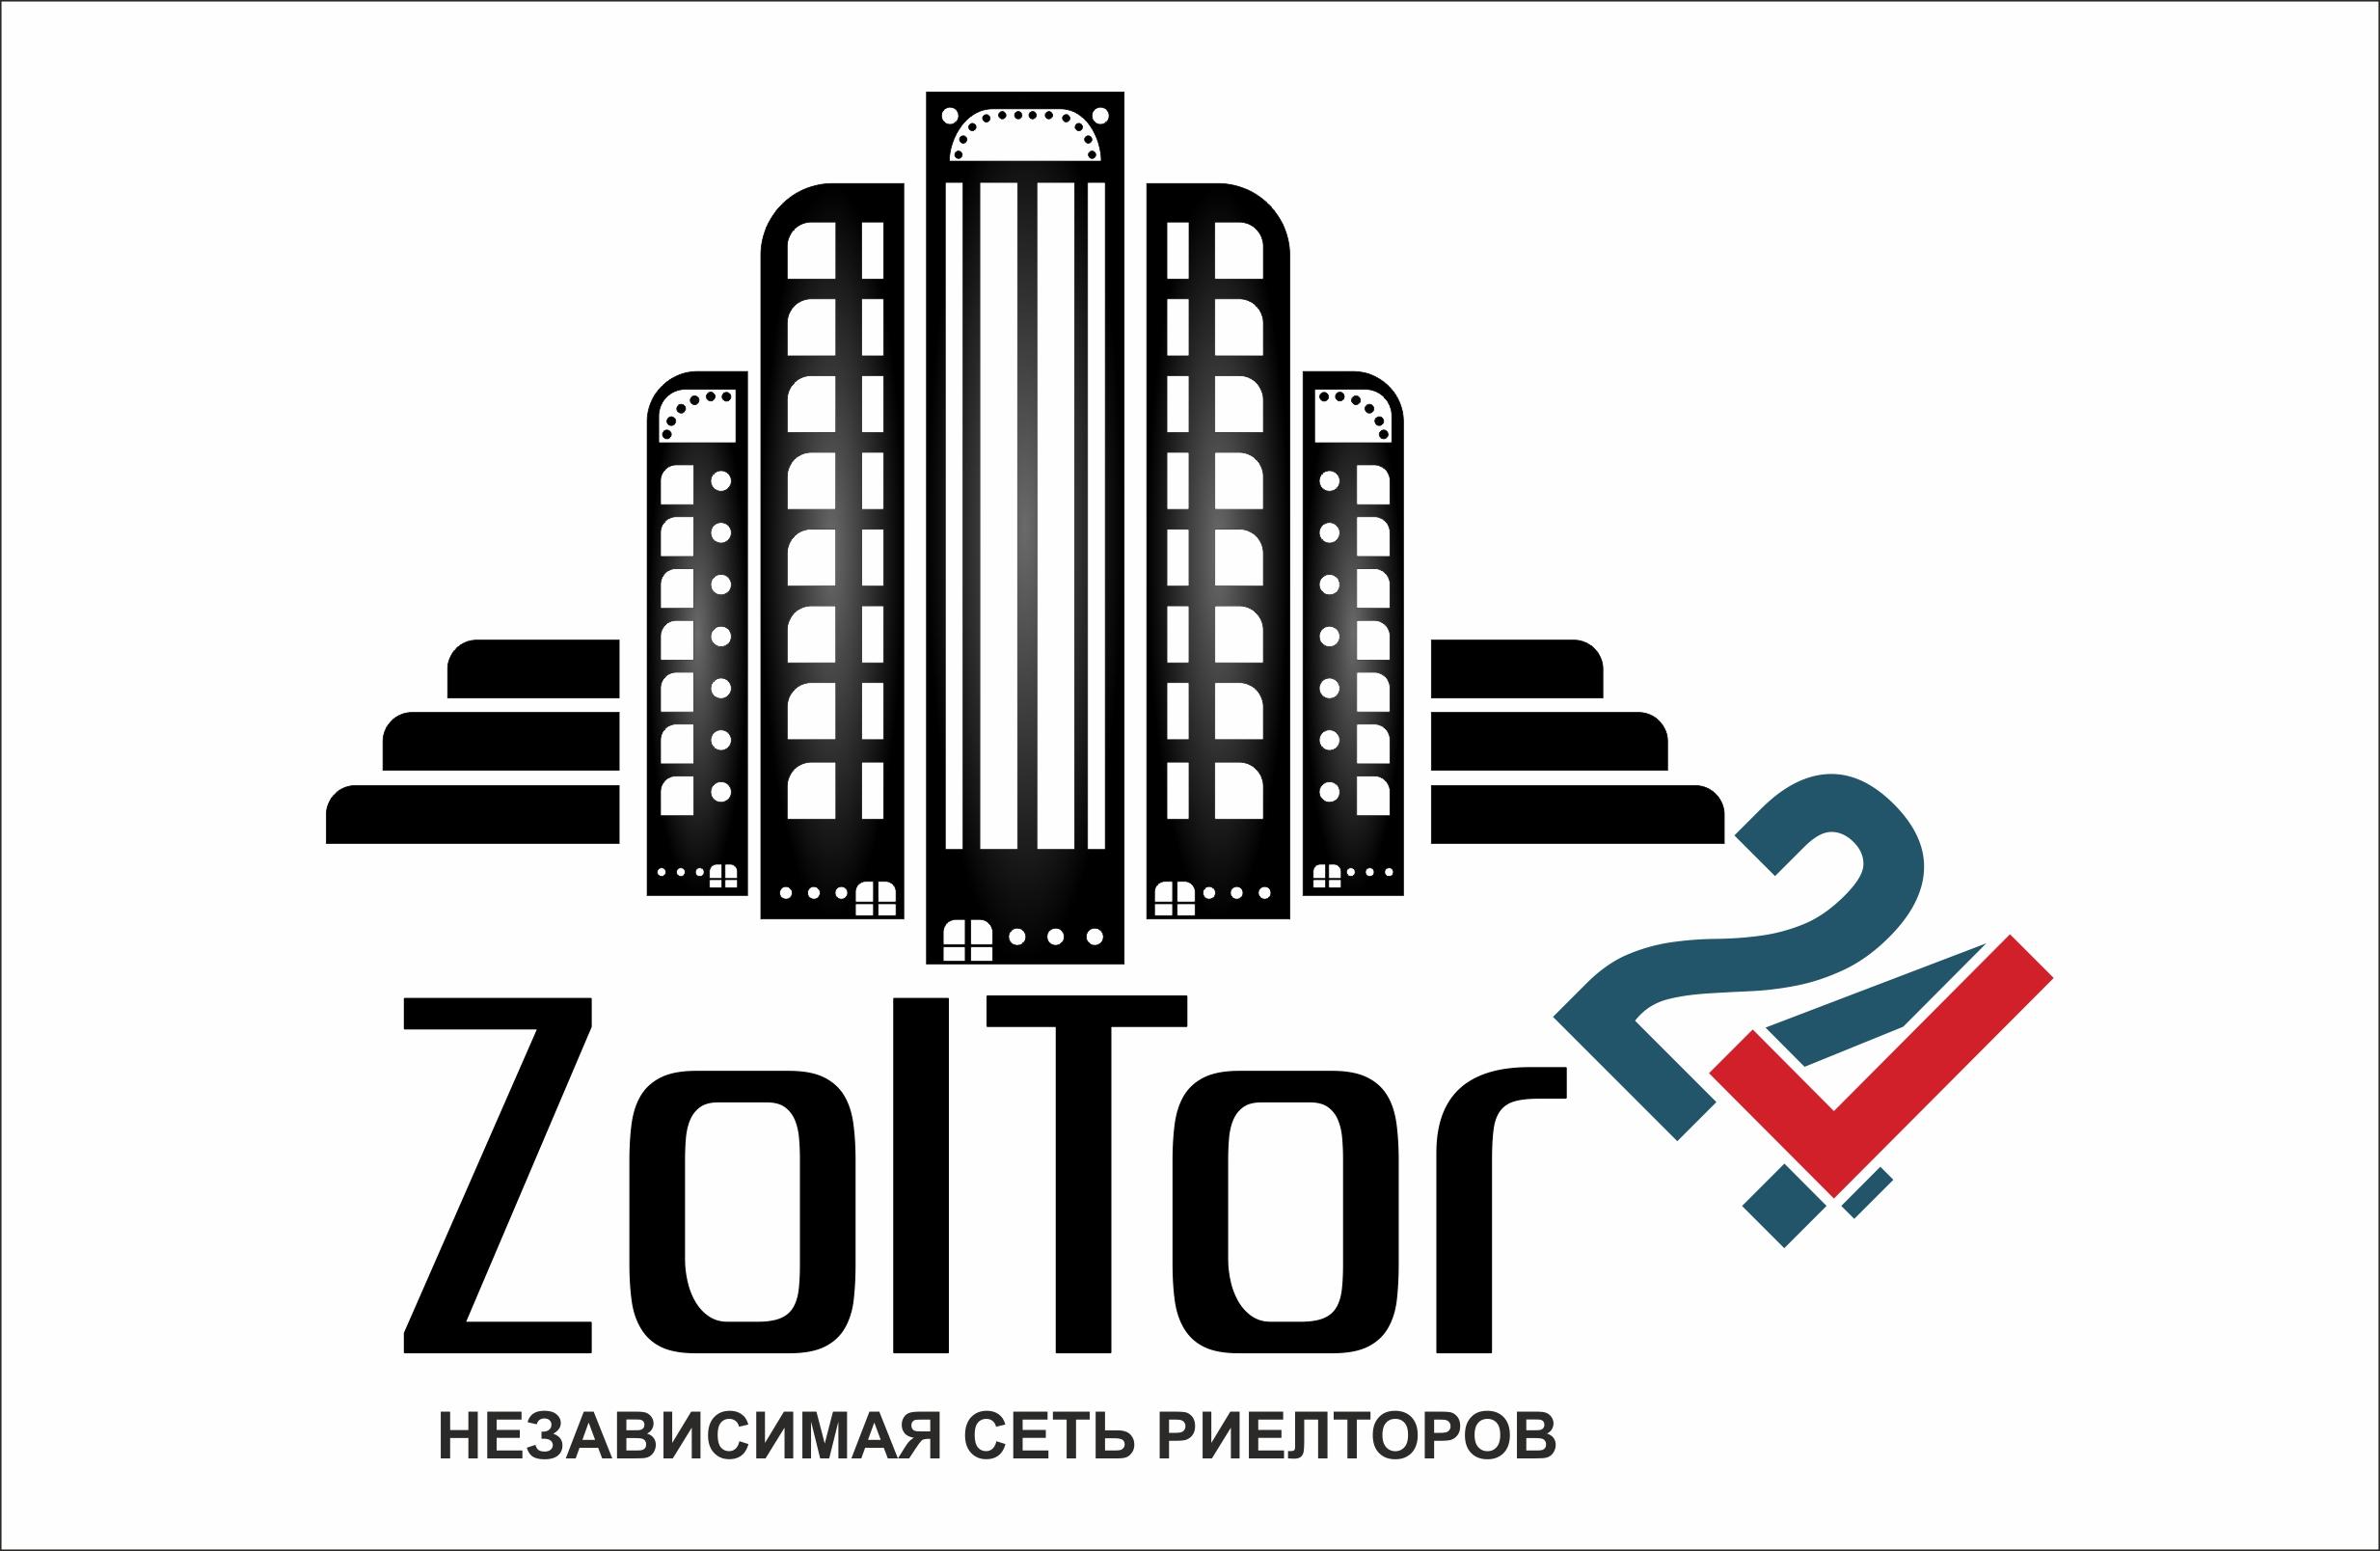 Логотип и фирменный стиль ZolTor24 фото f_4485c961a8f2640b.jpg